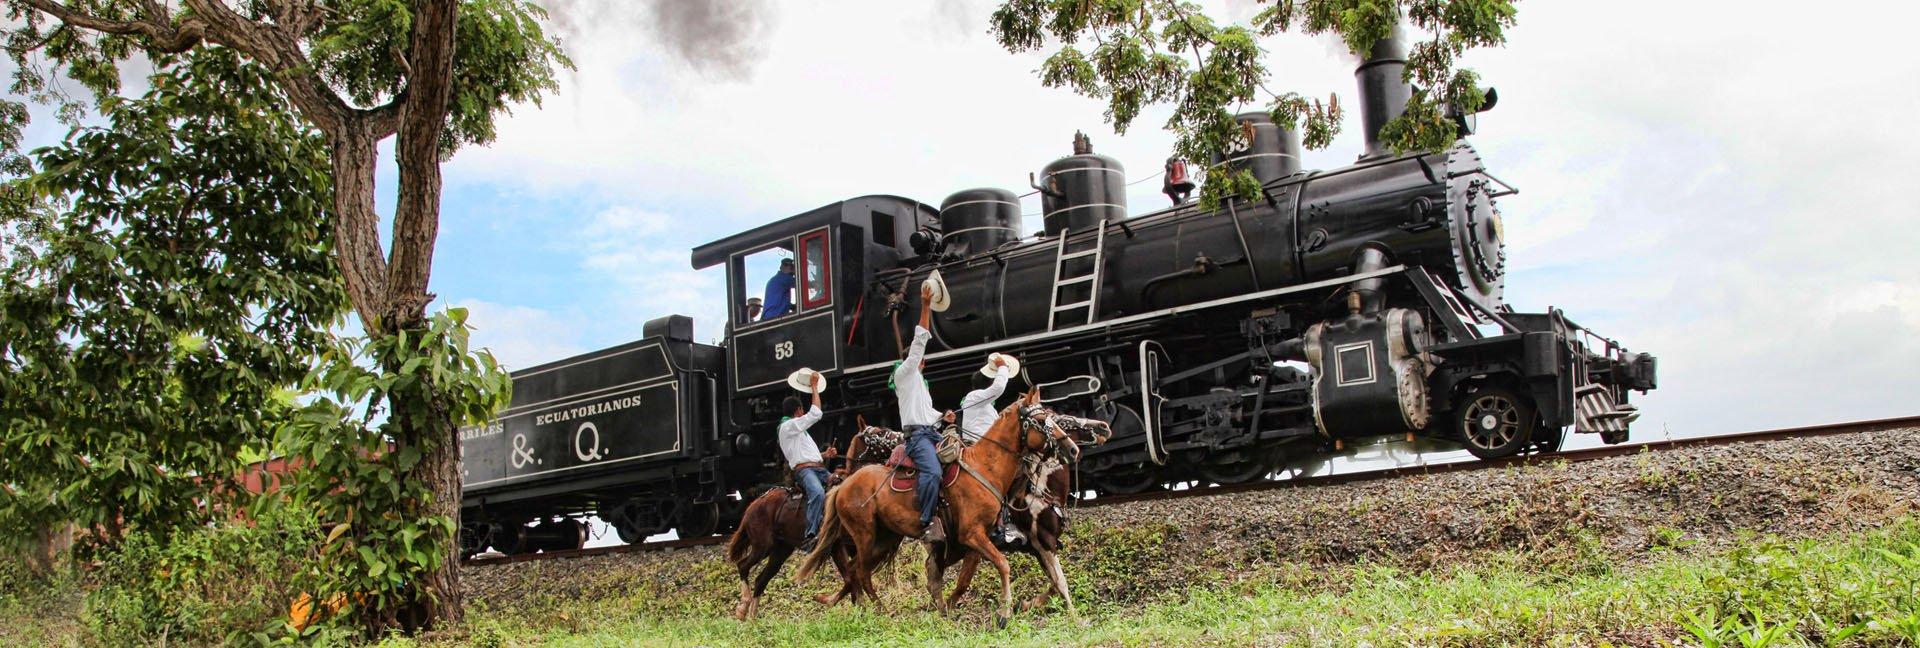 Reiseziele Südamerika - Tren Crucero